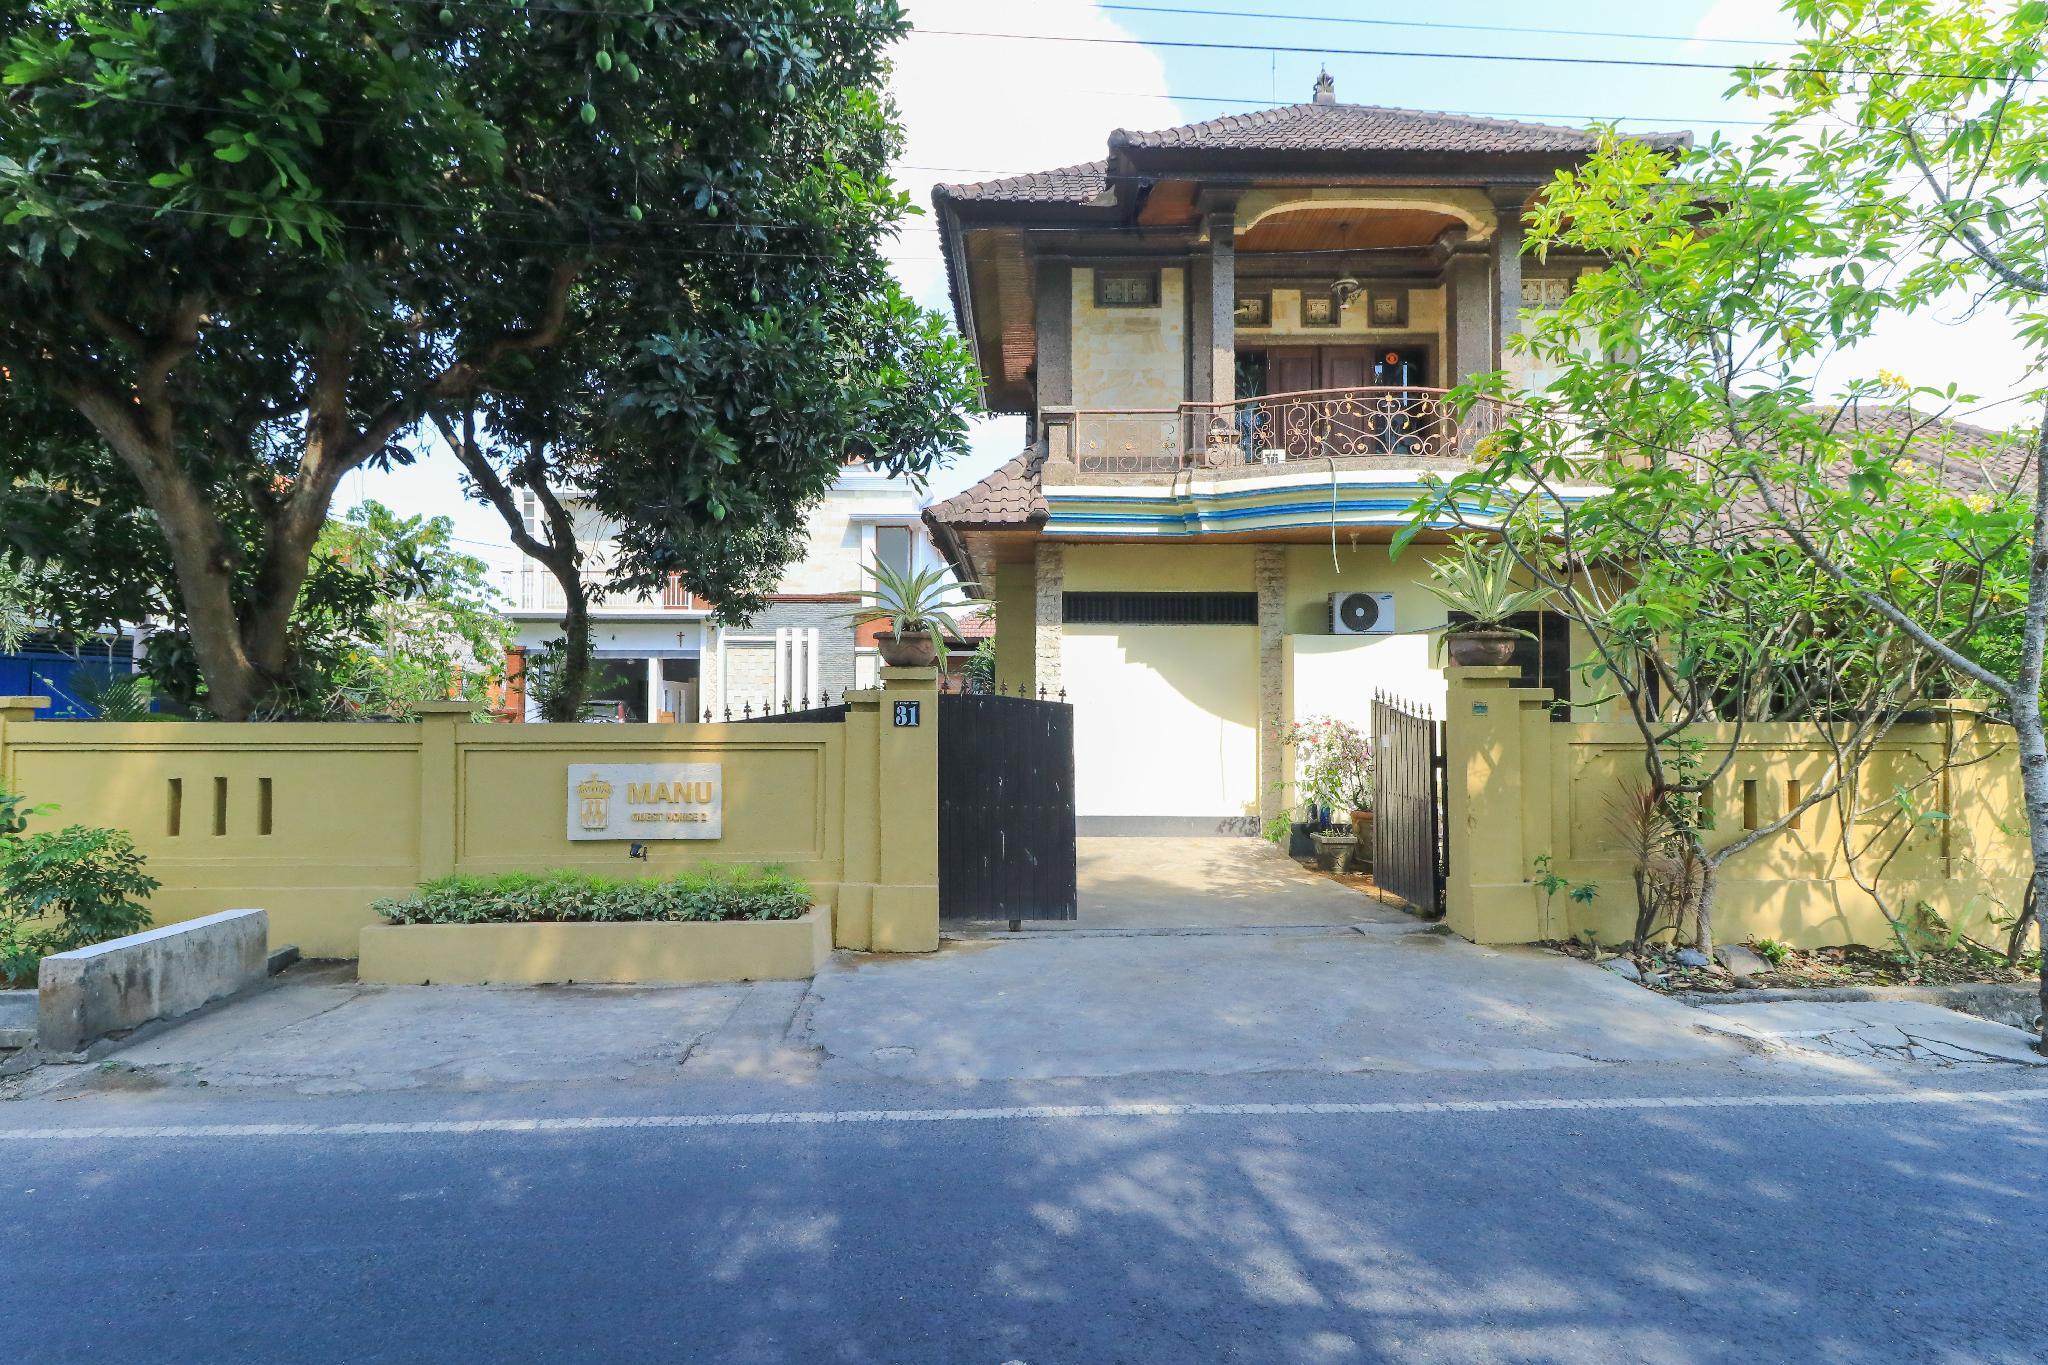 Manu Guest House 2